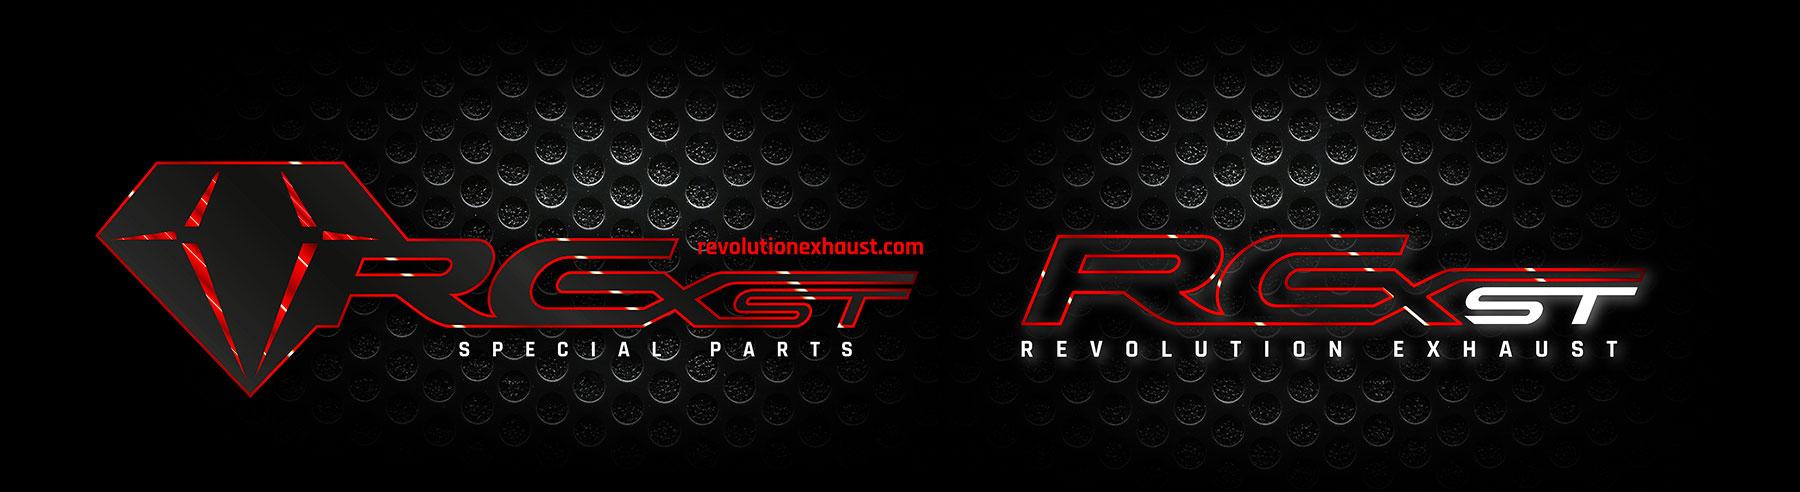 RevolutionsExhaust